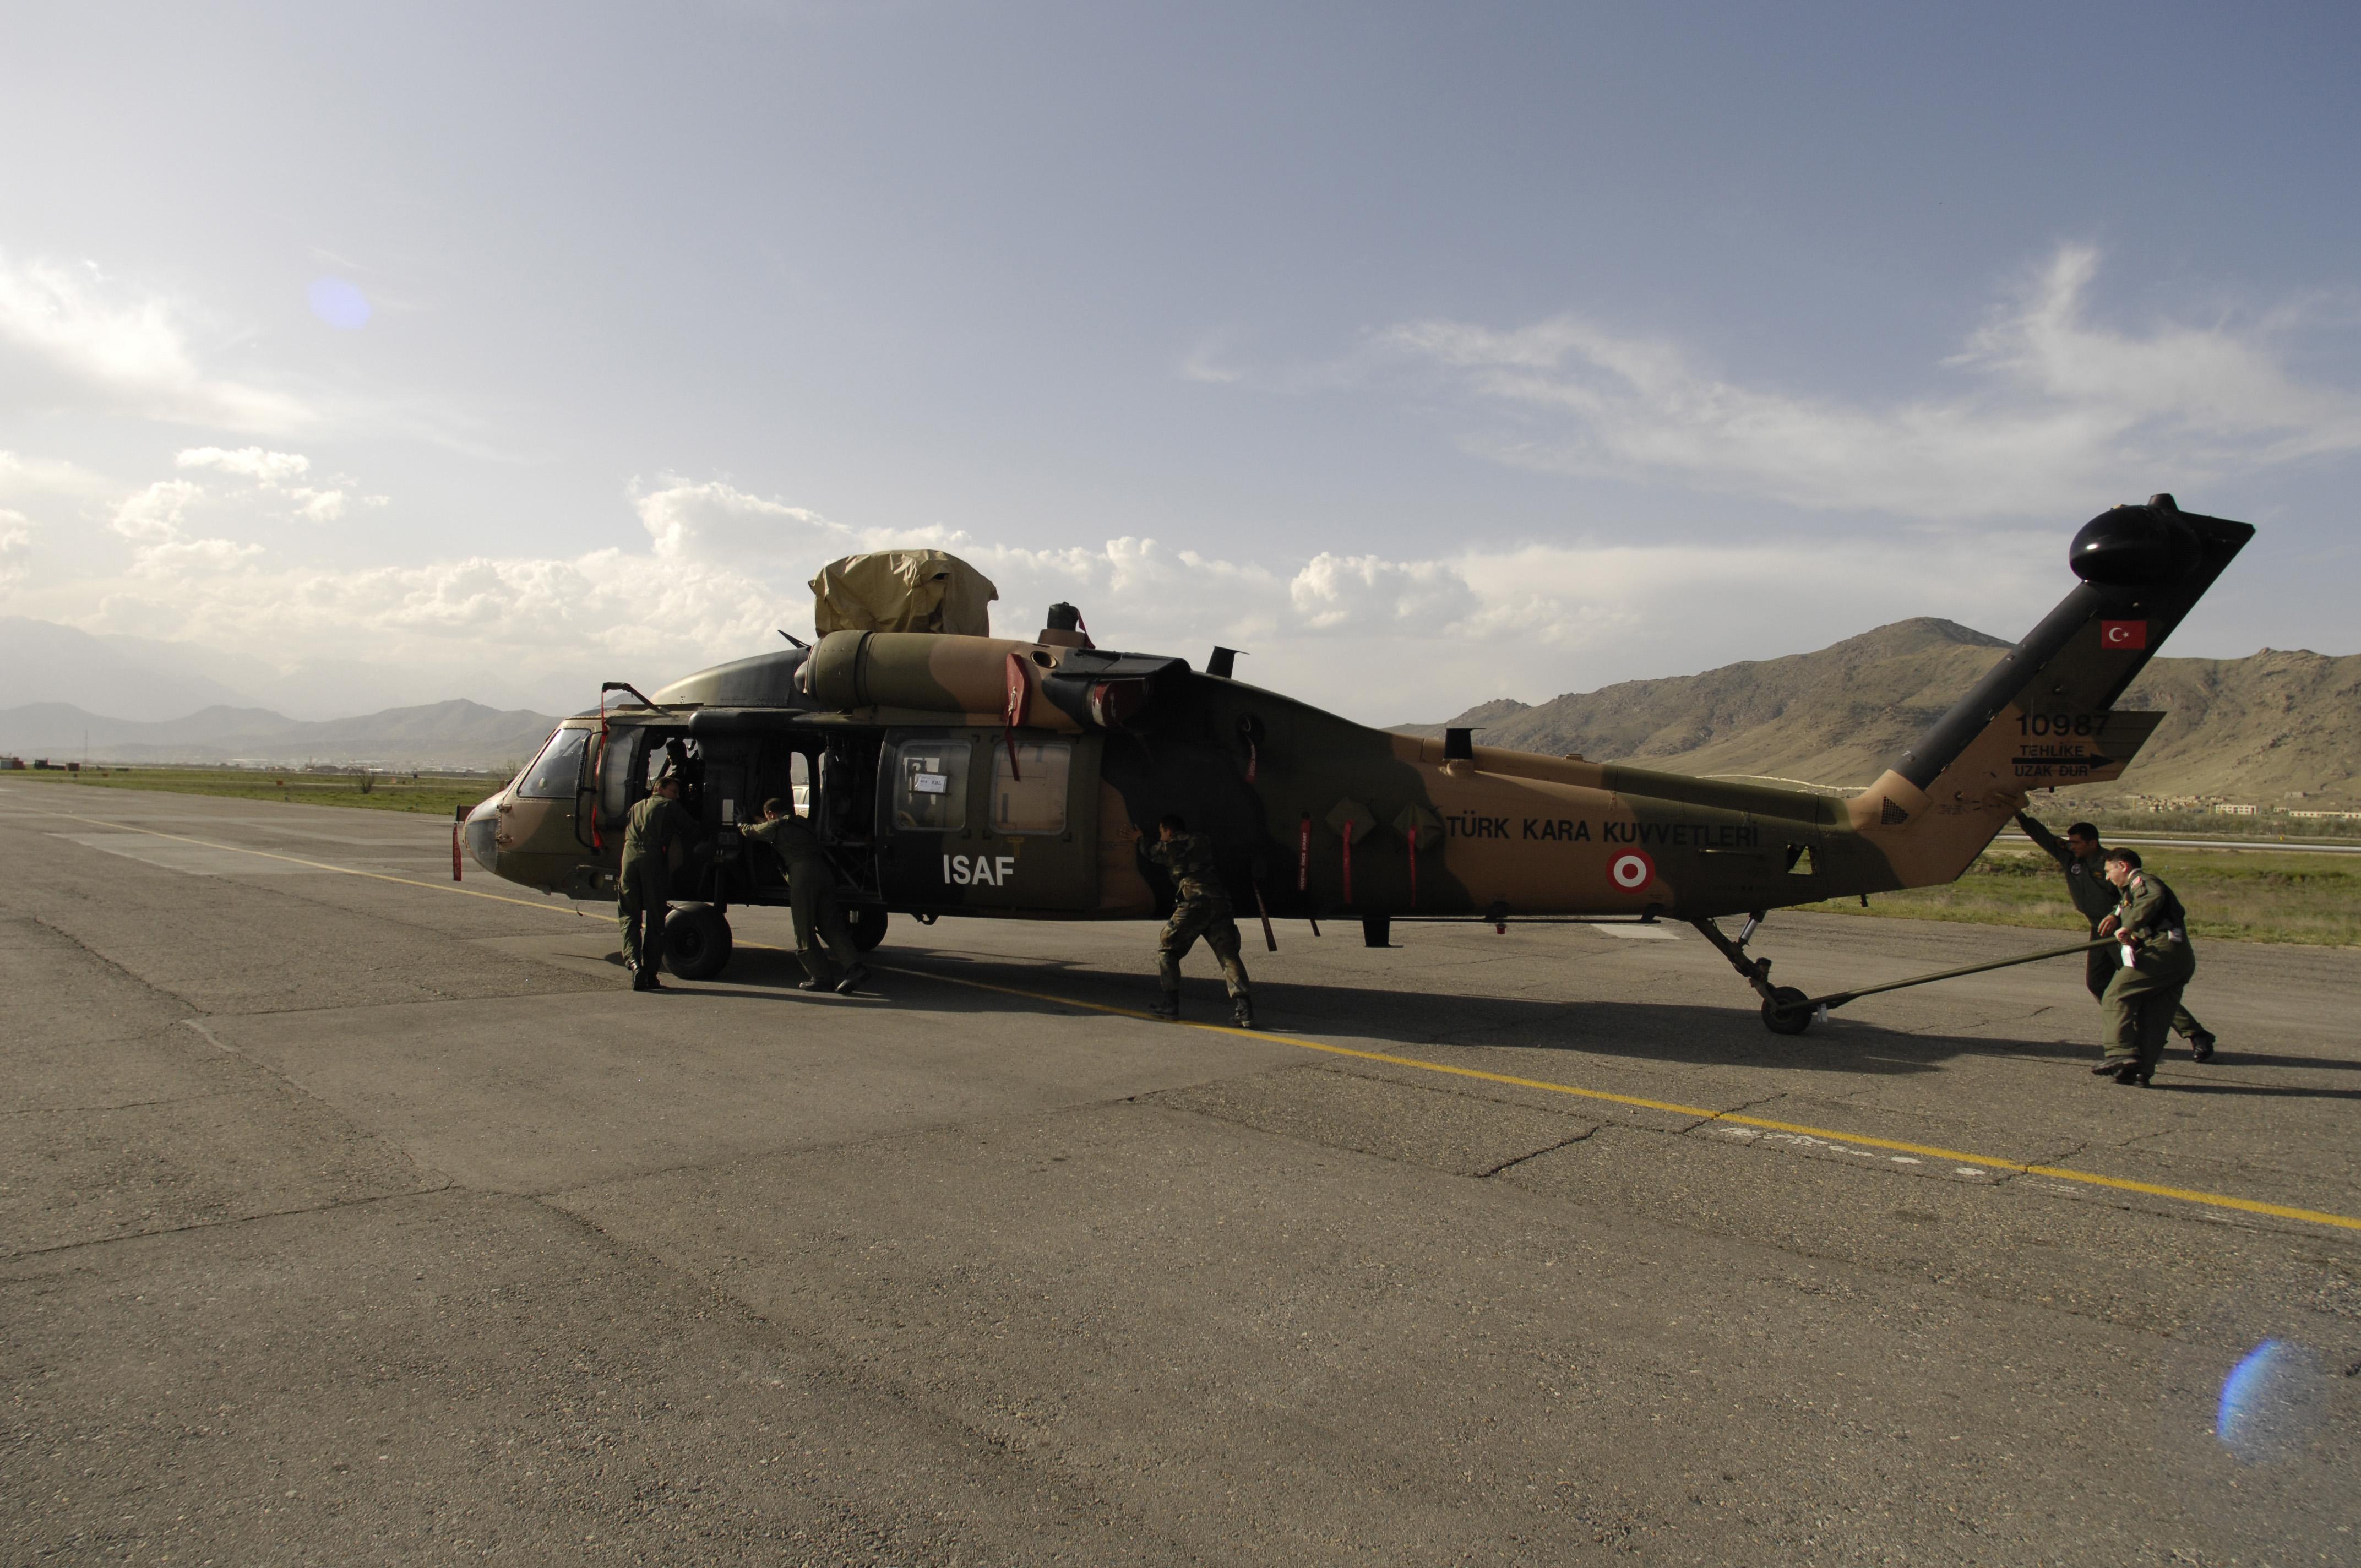 d294b32ca25 File:Turkish ISAF UH-60 Black Hawk helicopter.JPEG - Wikimedia Commons